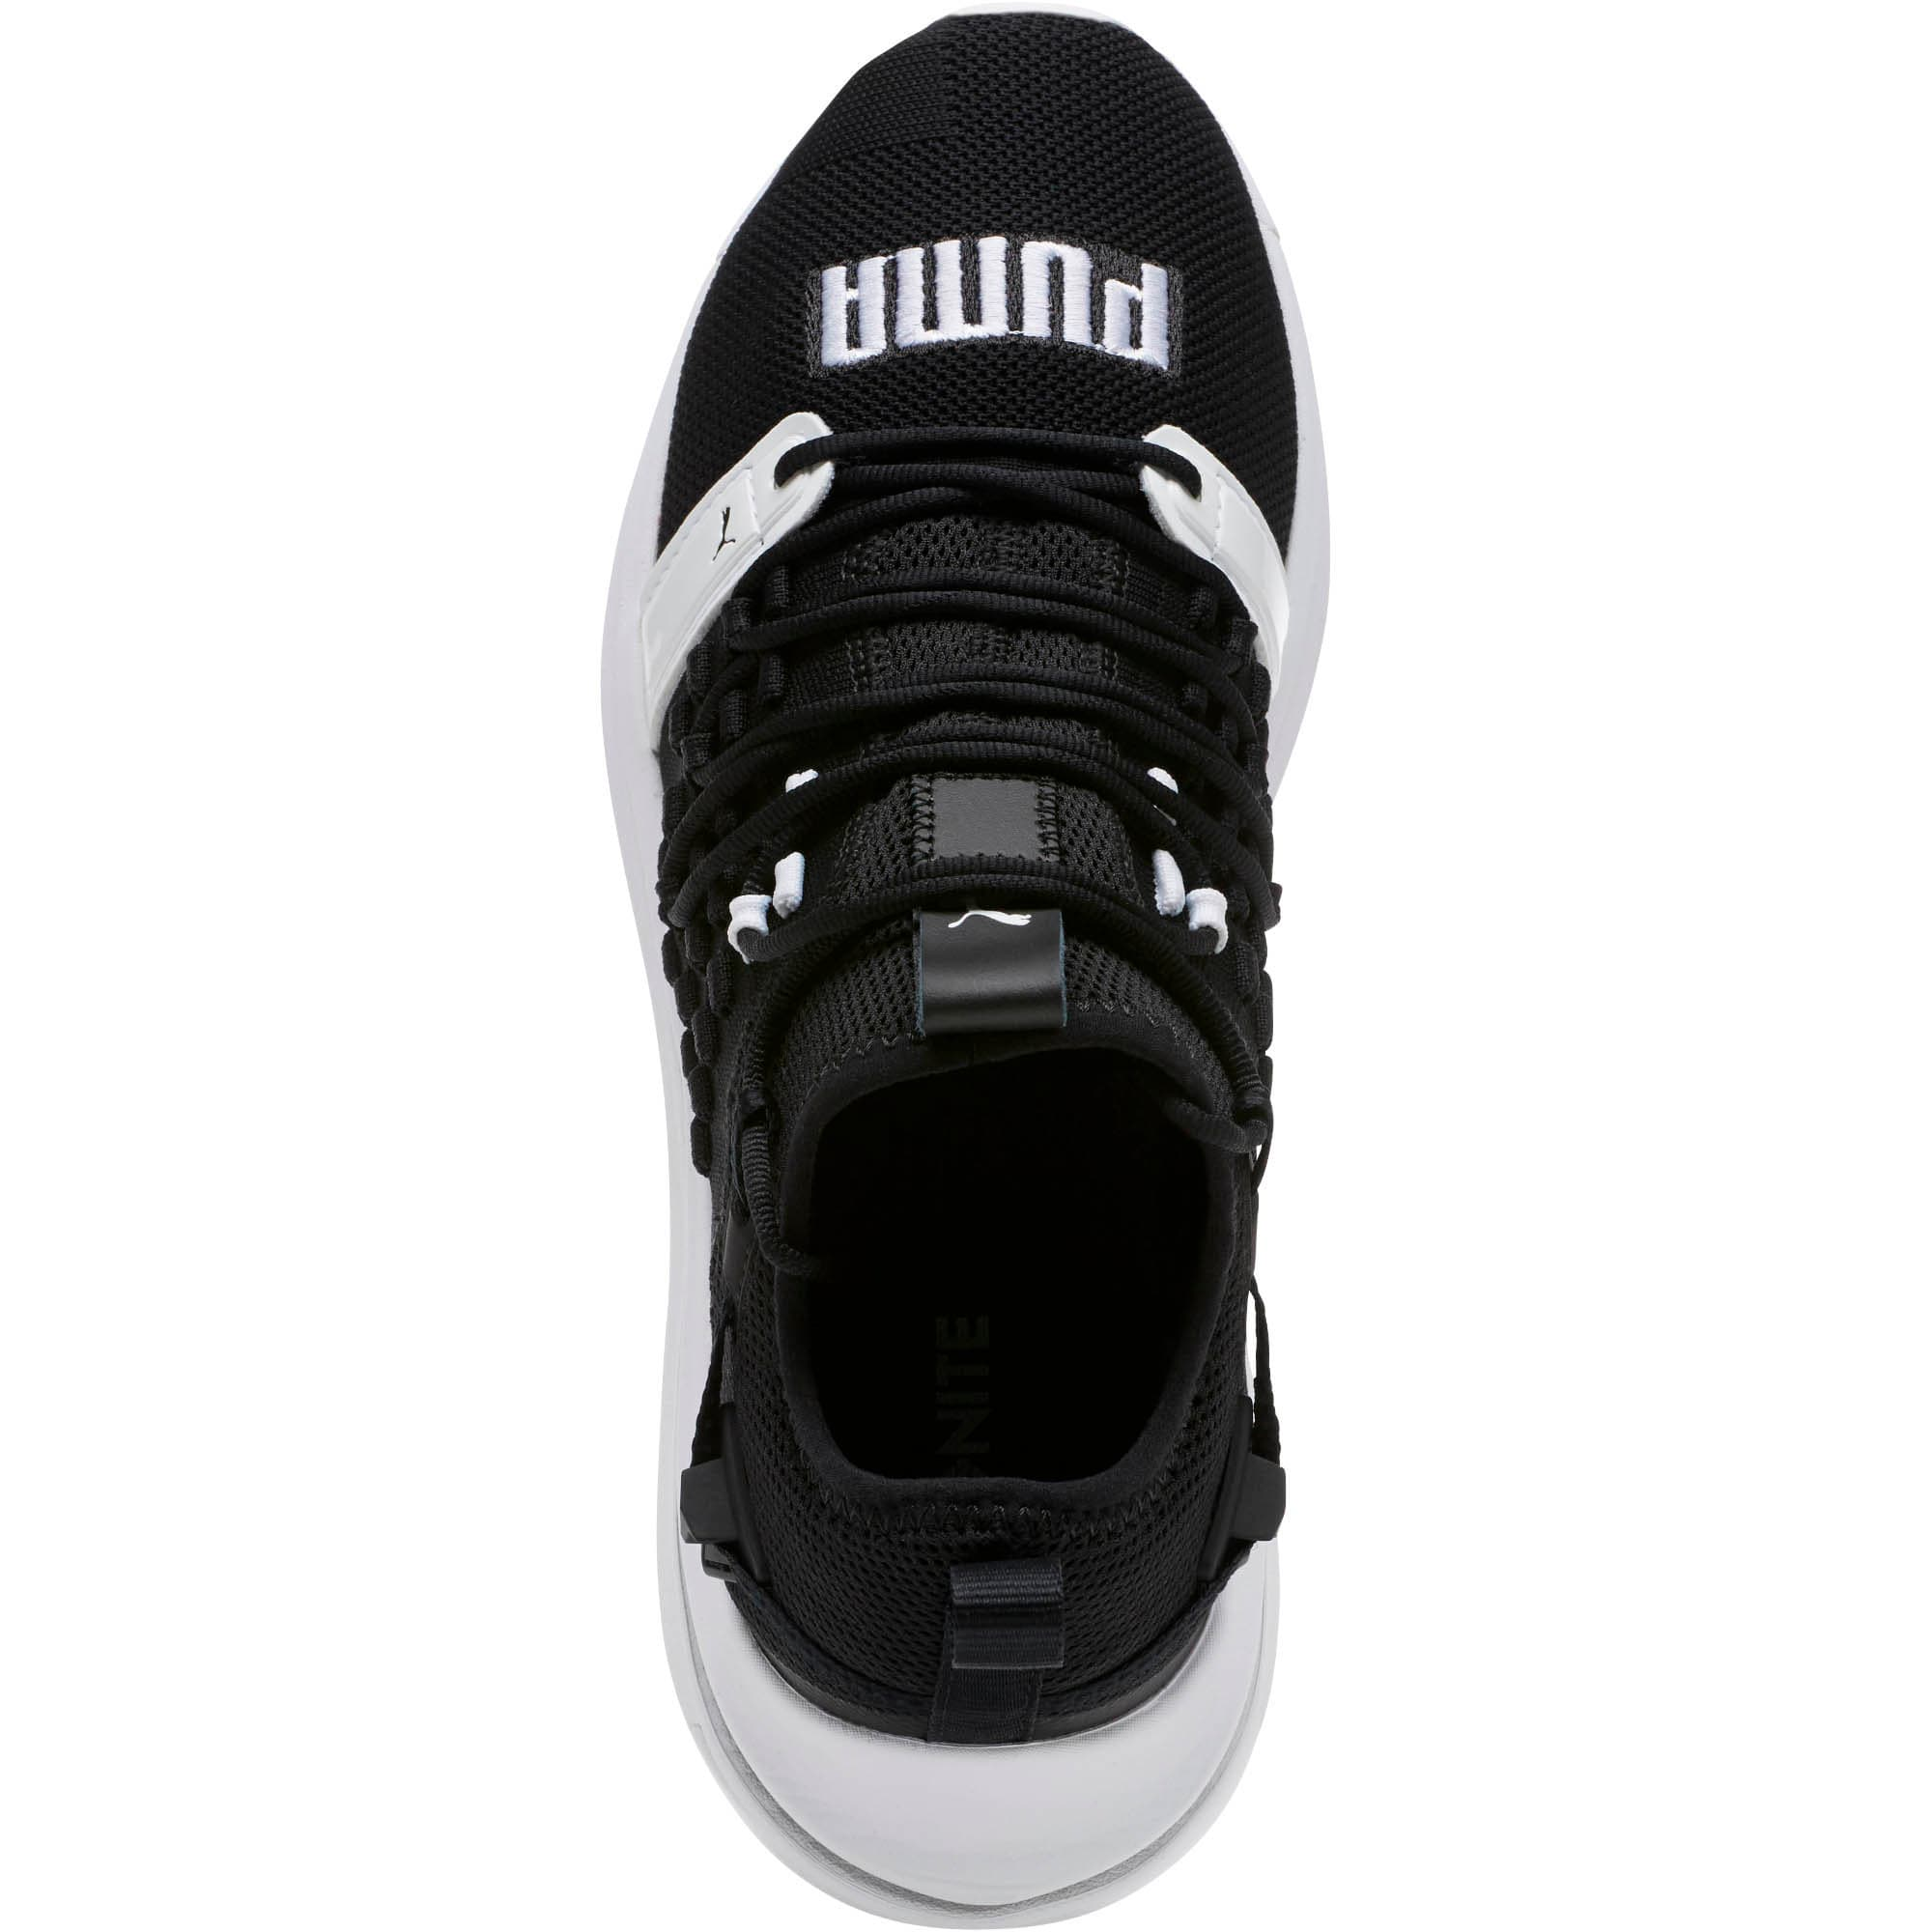 Thumbnail 5 of IGNITE Limitless SR FUSEFIT Running Shoes, Puma Black-Puma White, medium